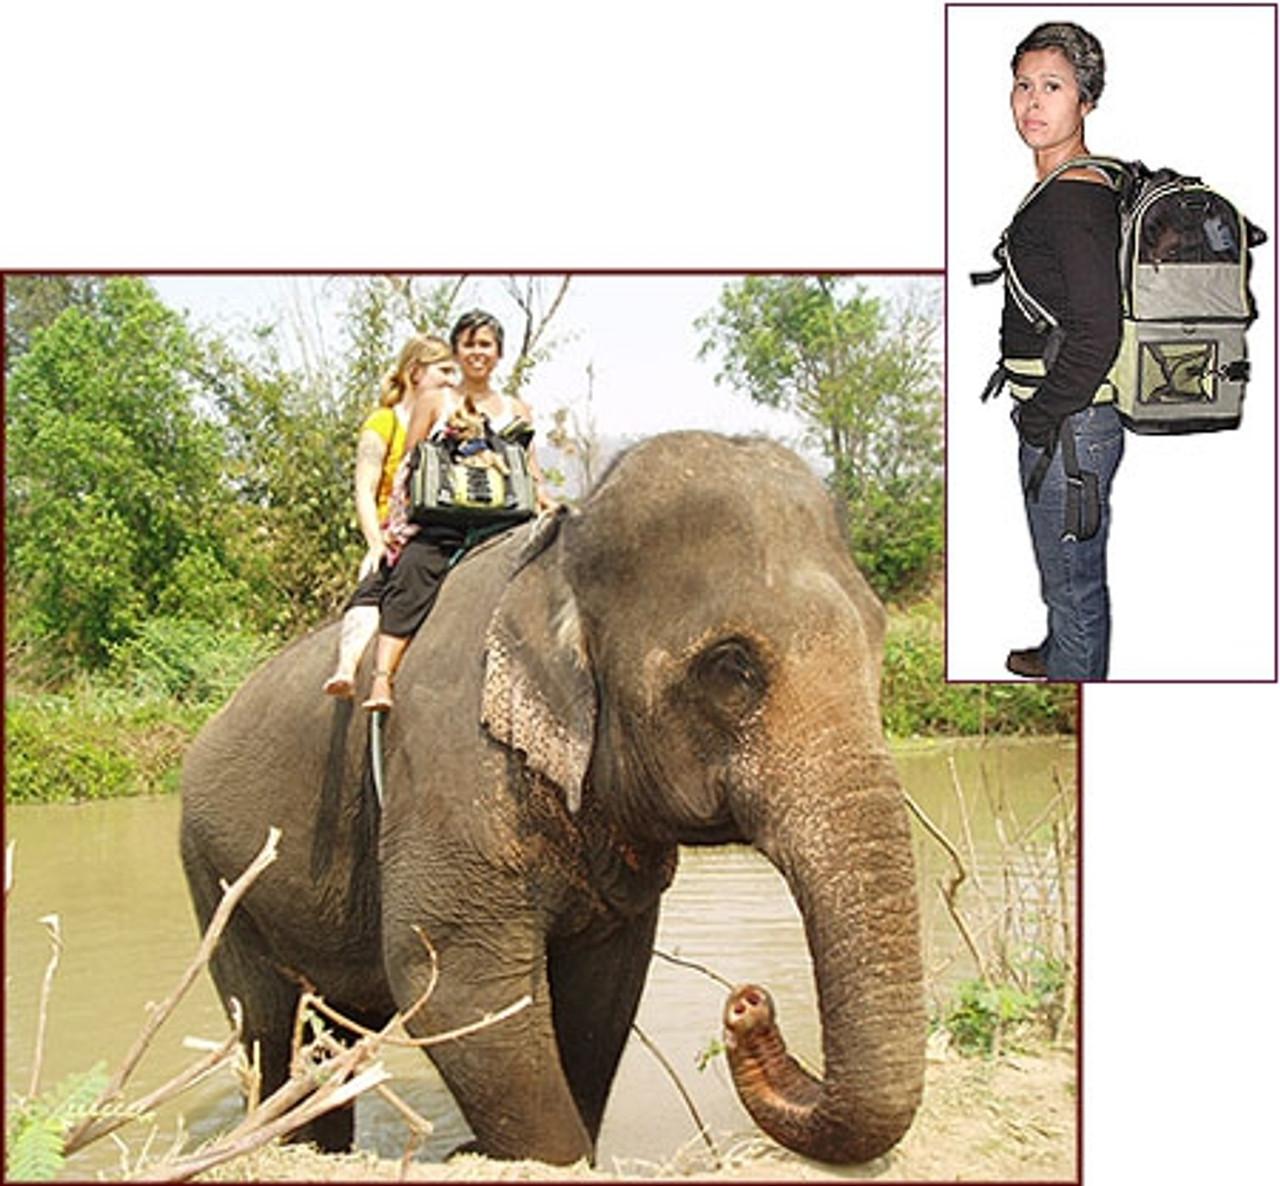 Elephant ride with my dog (2006 Winner)